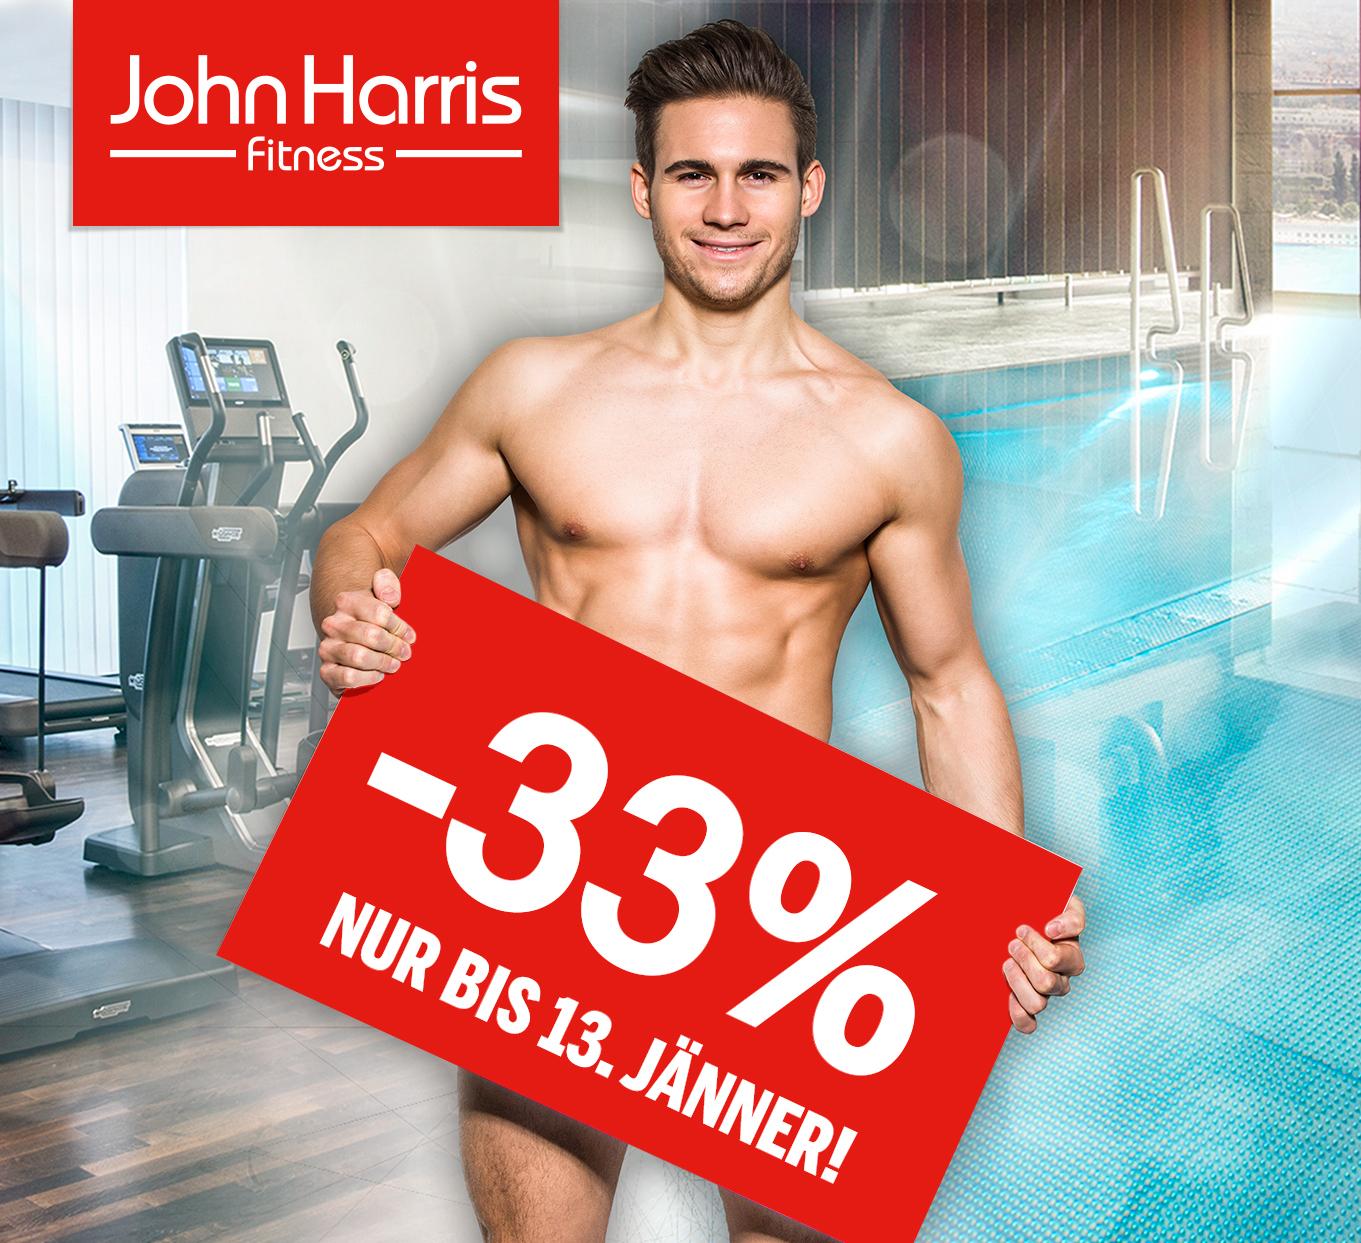 -33% bei John Harris Fitness